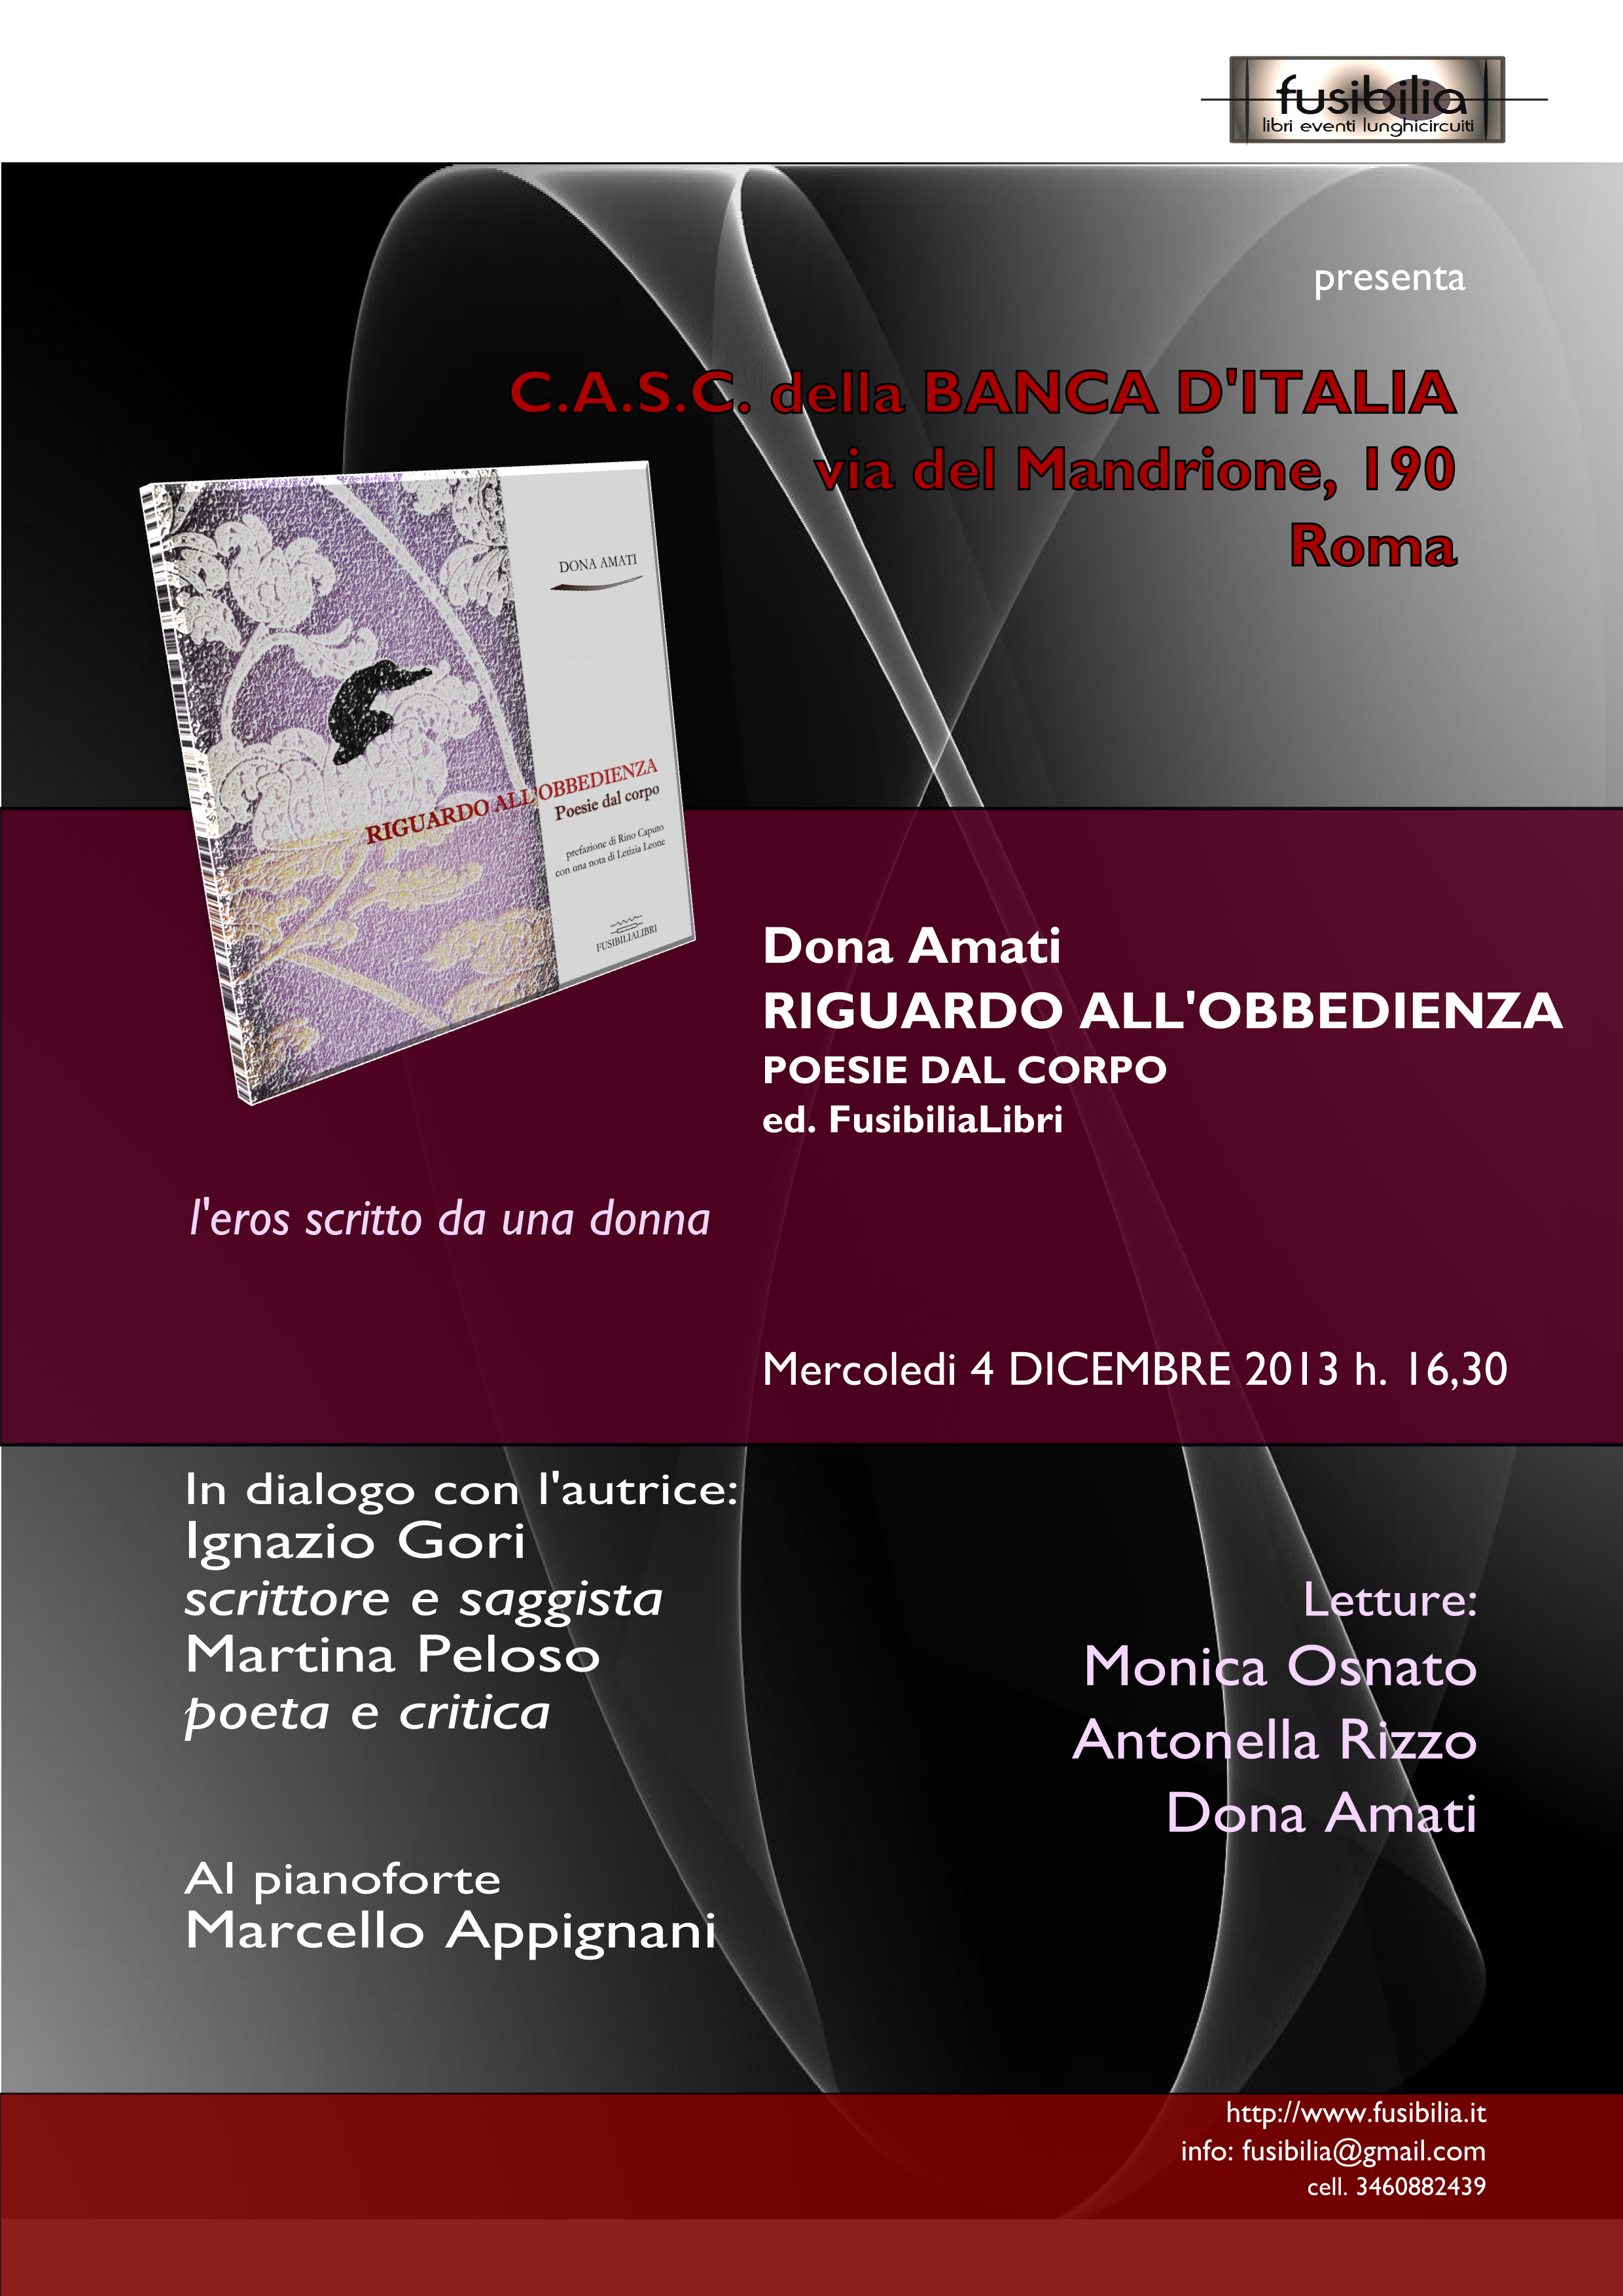 loca_Riguardo_obbedienza_Banca d'Italia